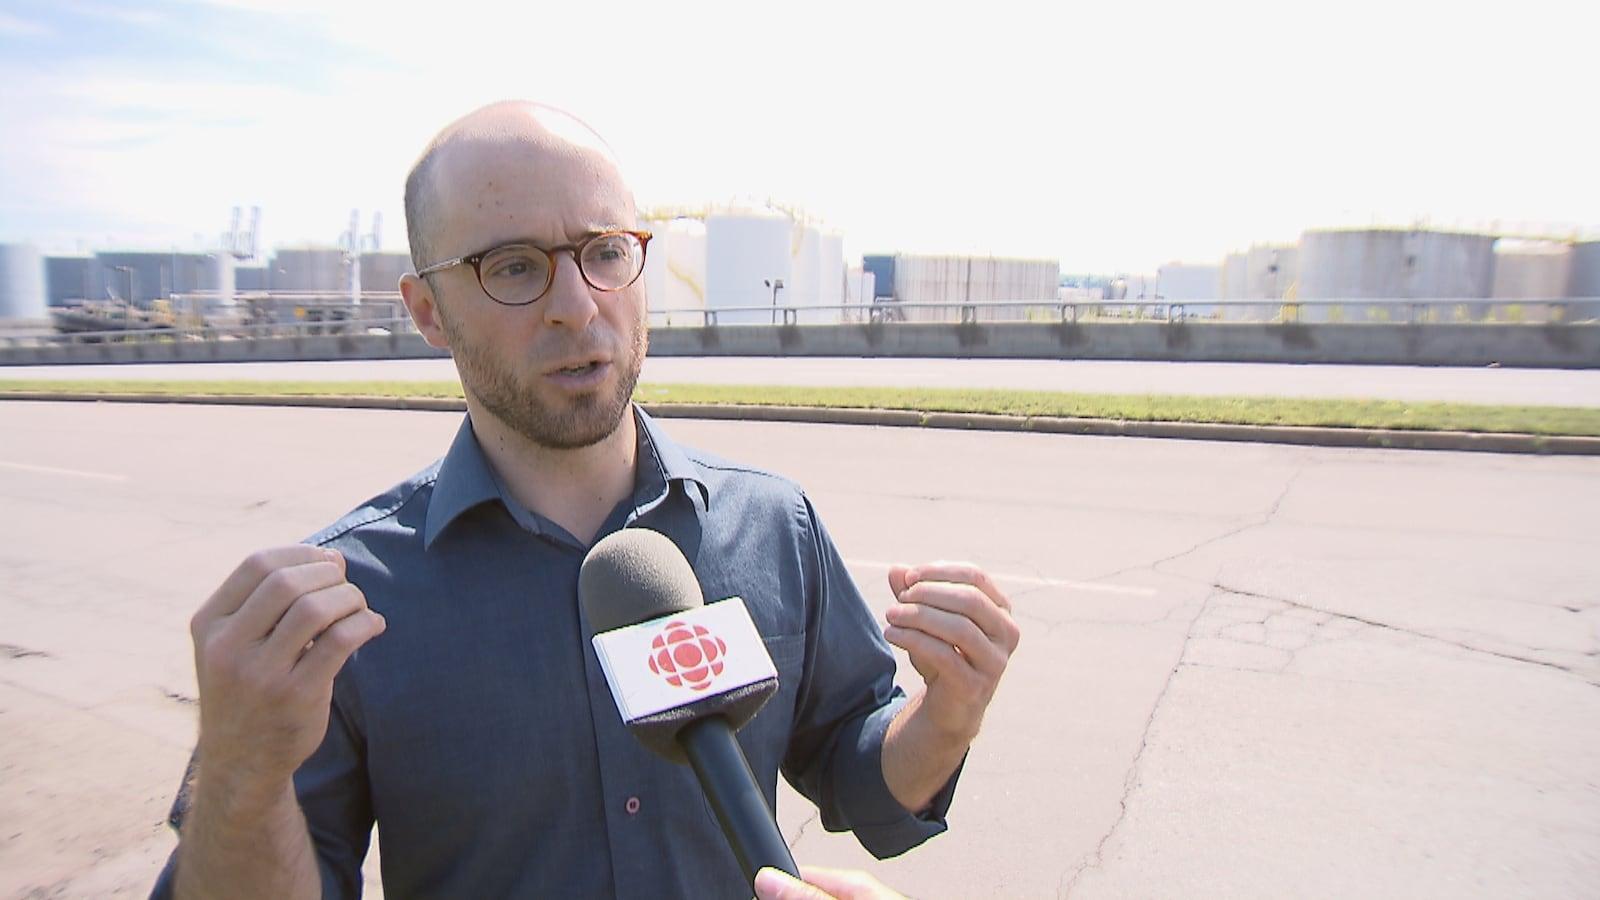 Sol Zanetti, candidat de Québec solidaire dans la circonscription de Jean-Lesage